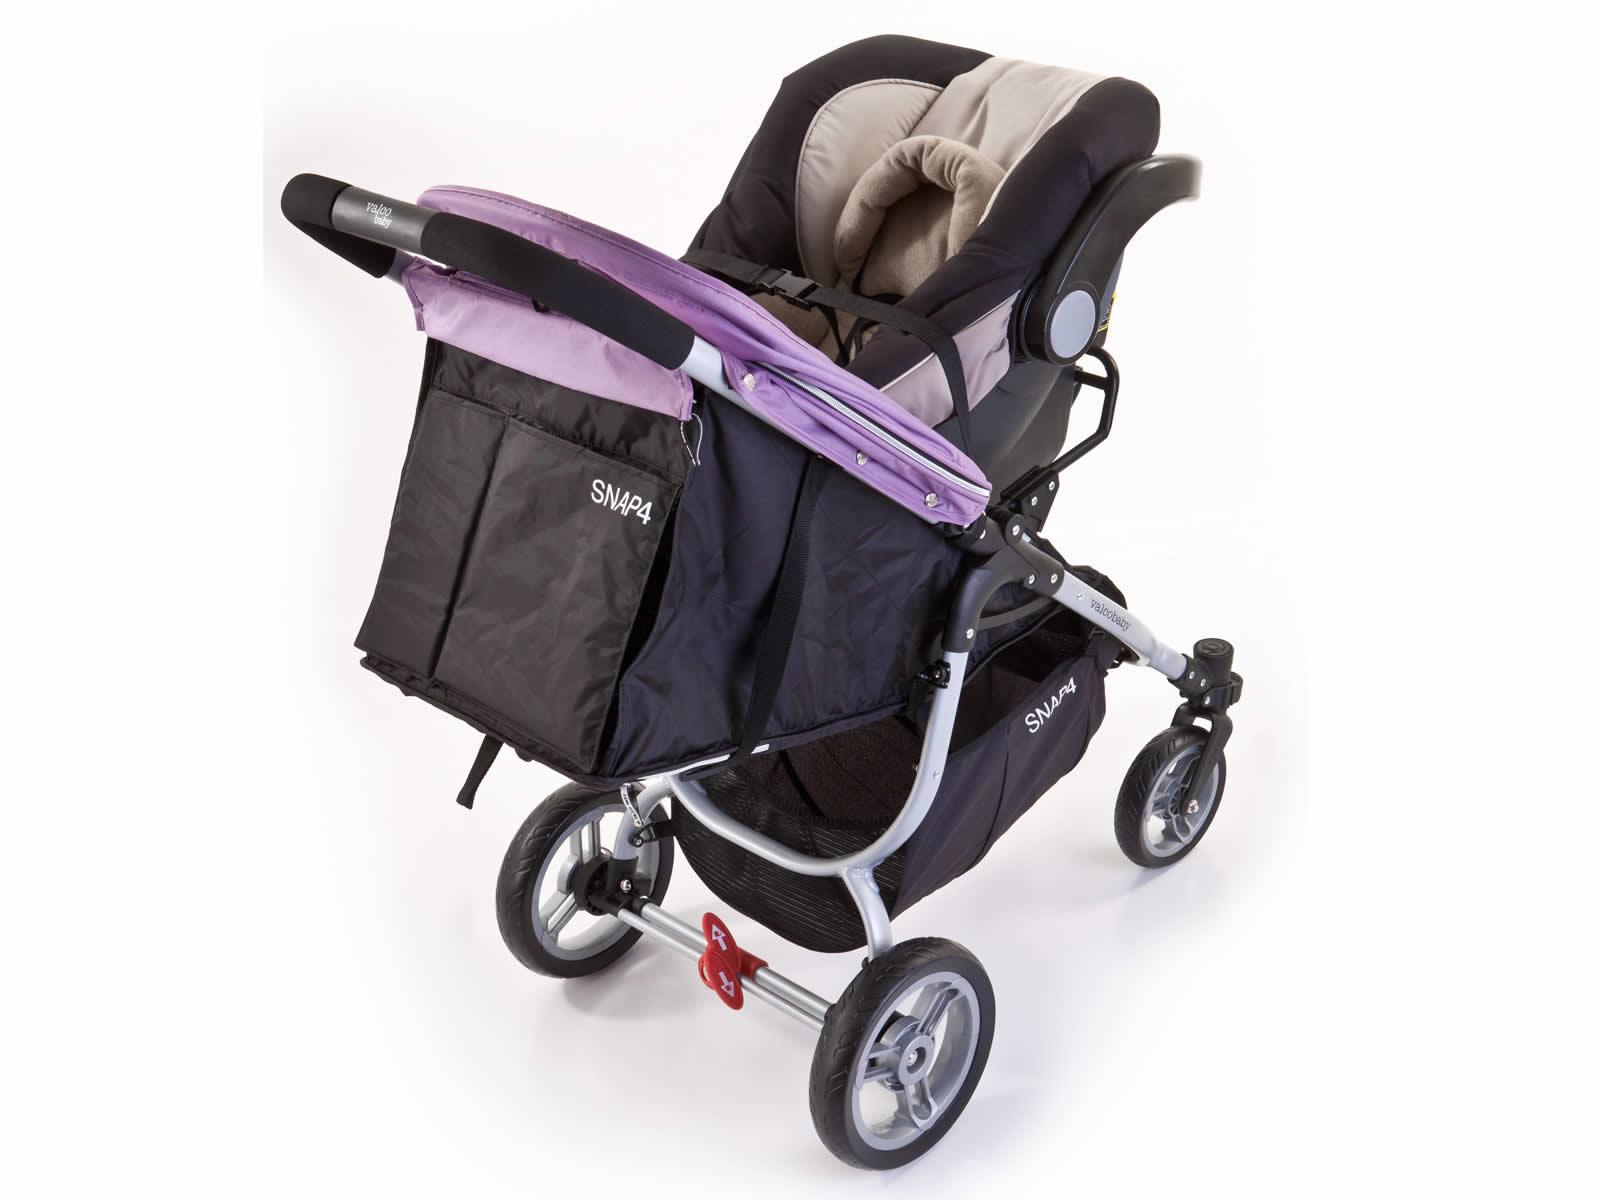 Snap with Safe-n-Sound infant carrier